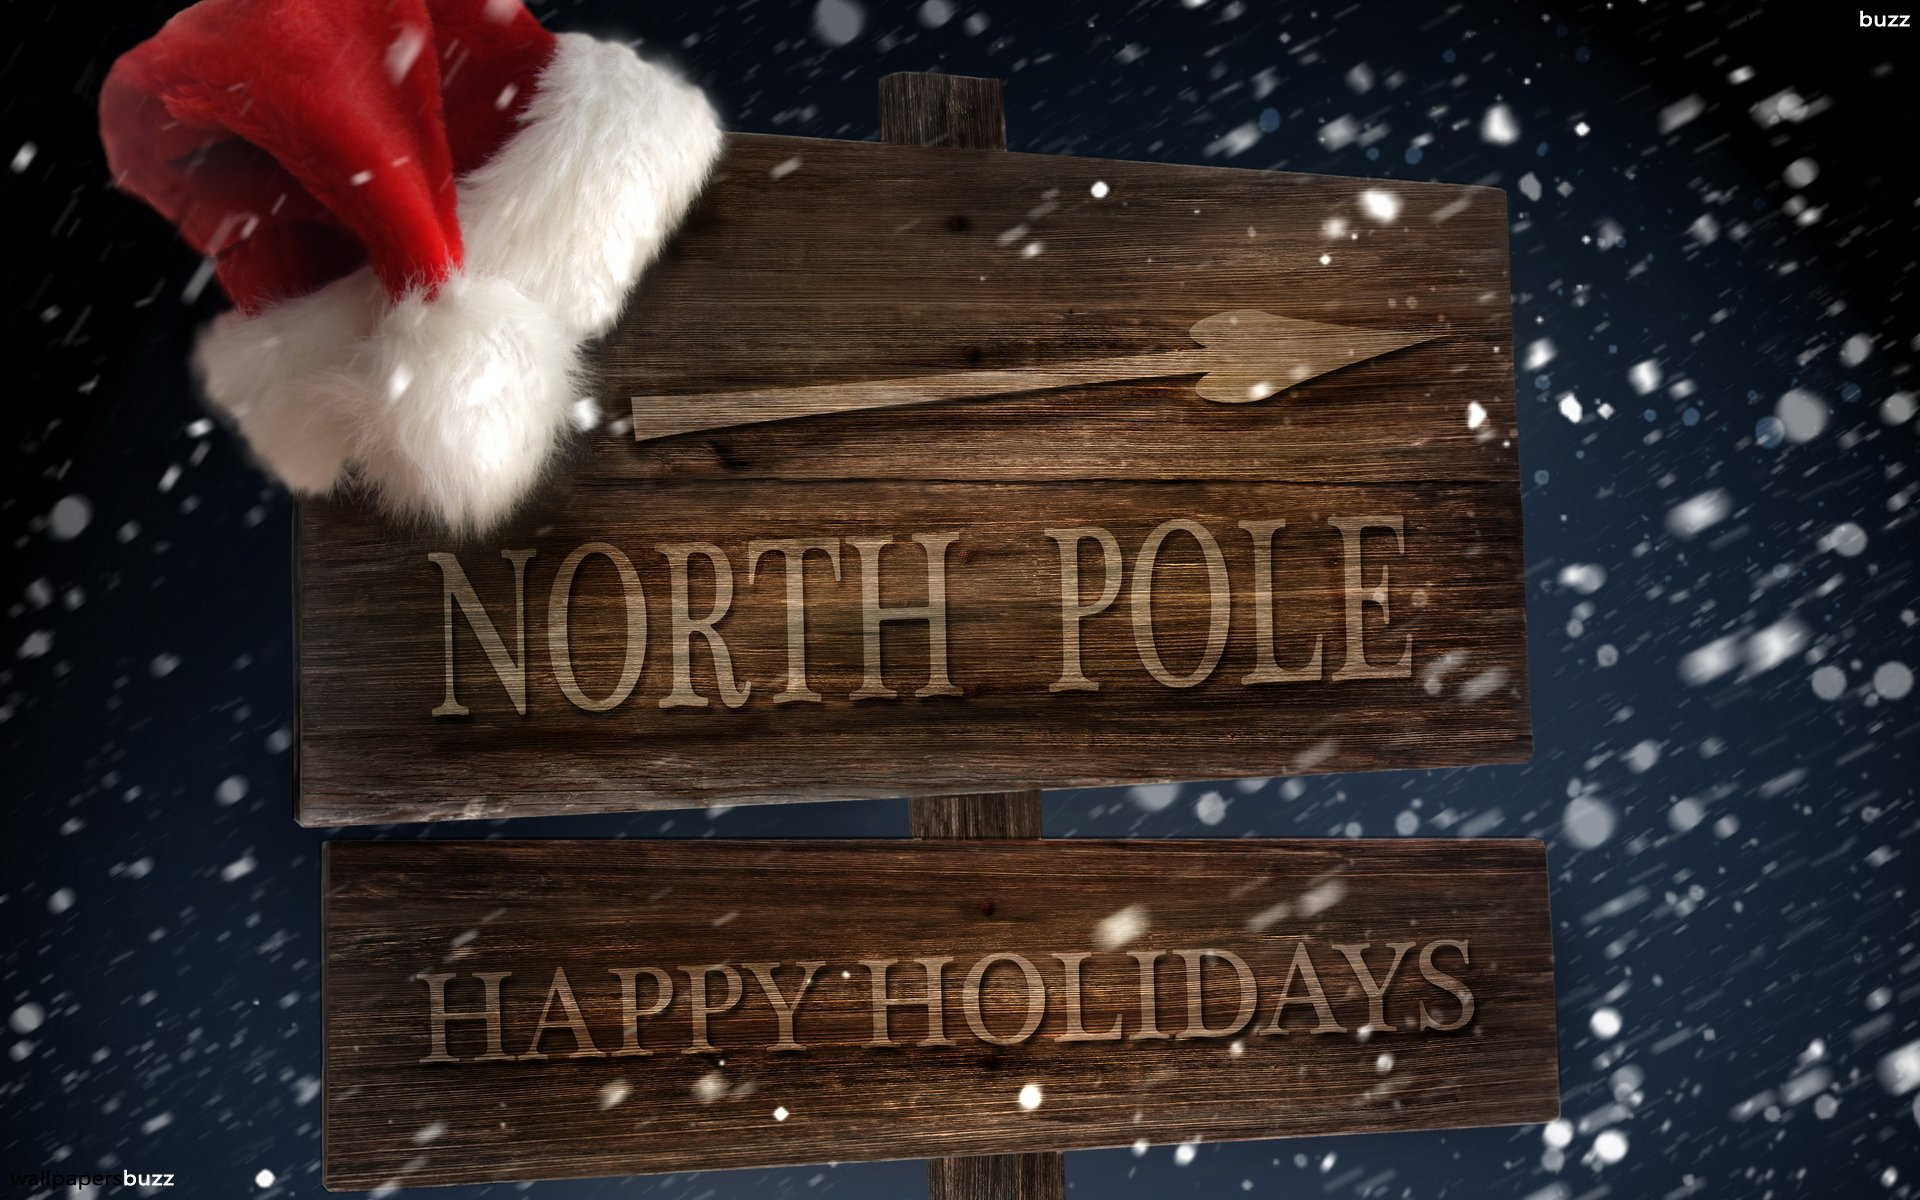 The The North Pole HD Wallpaper 1920x1200